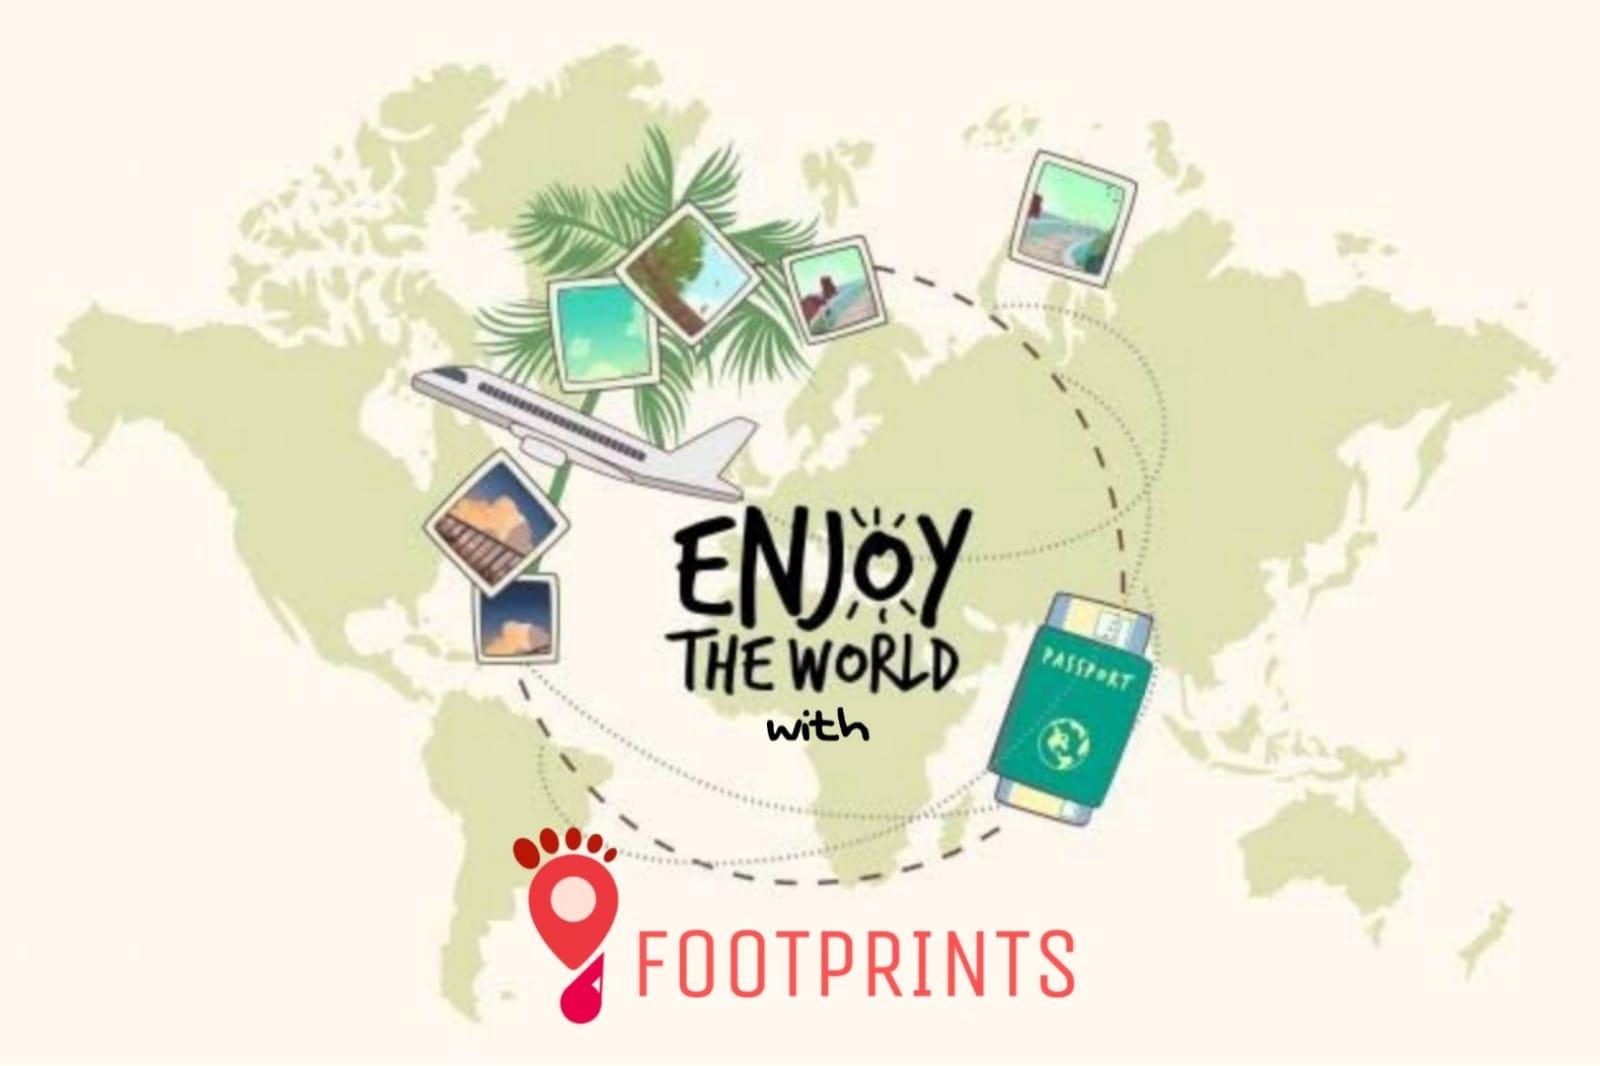 Footprints showcase